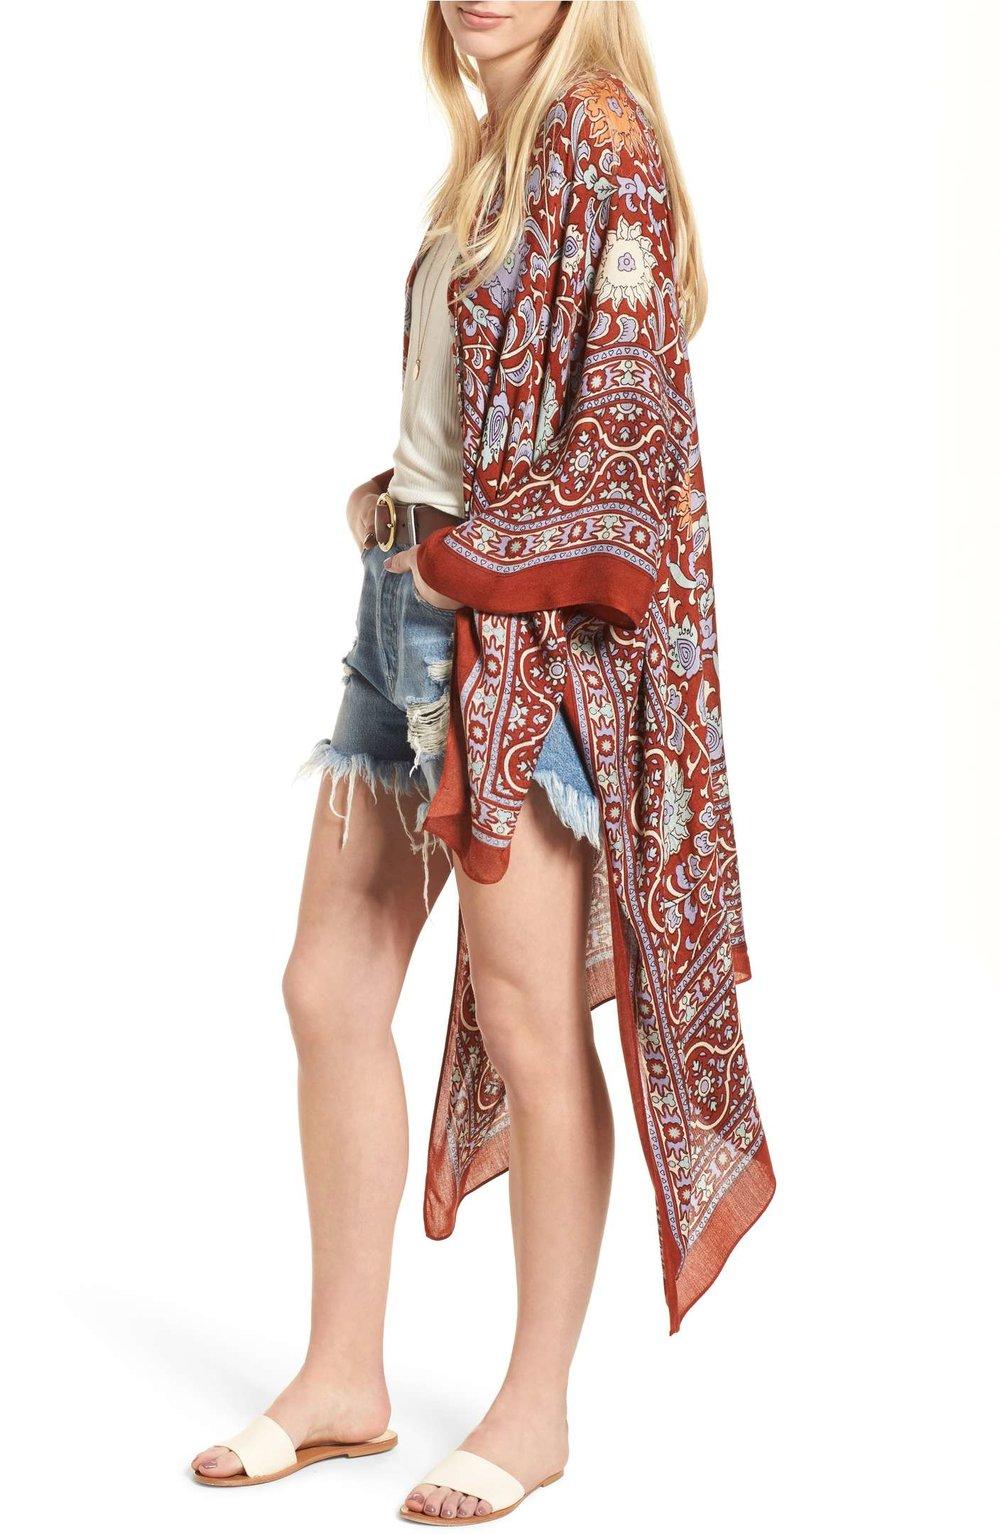 Spring Fashion: Kimono